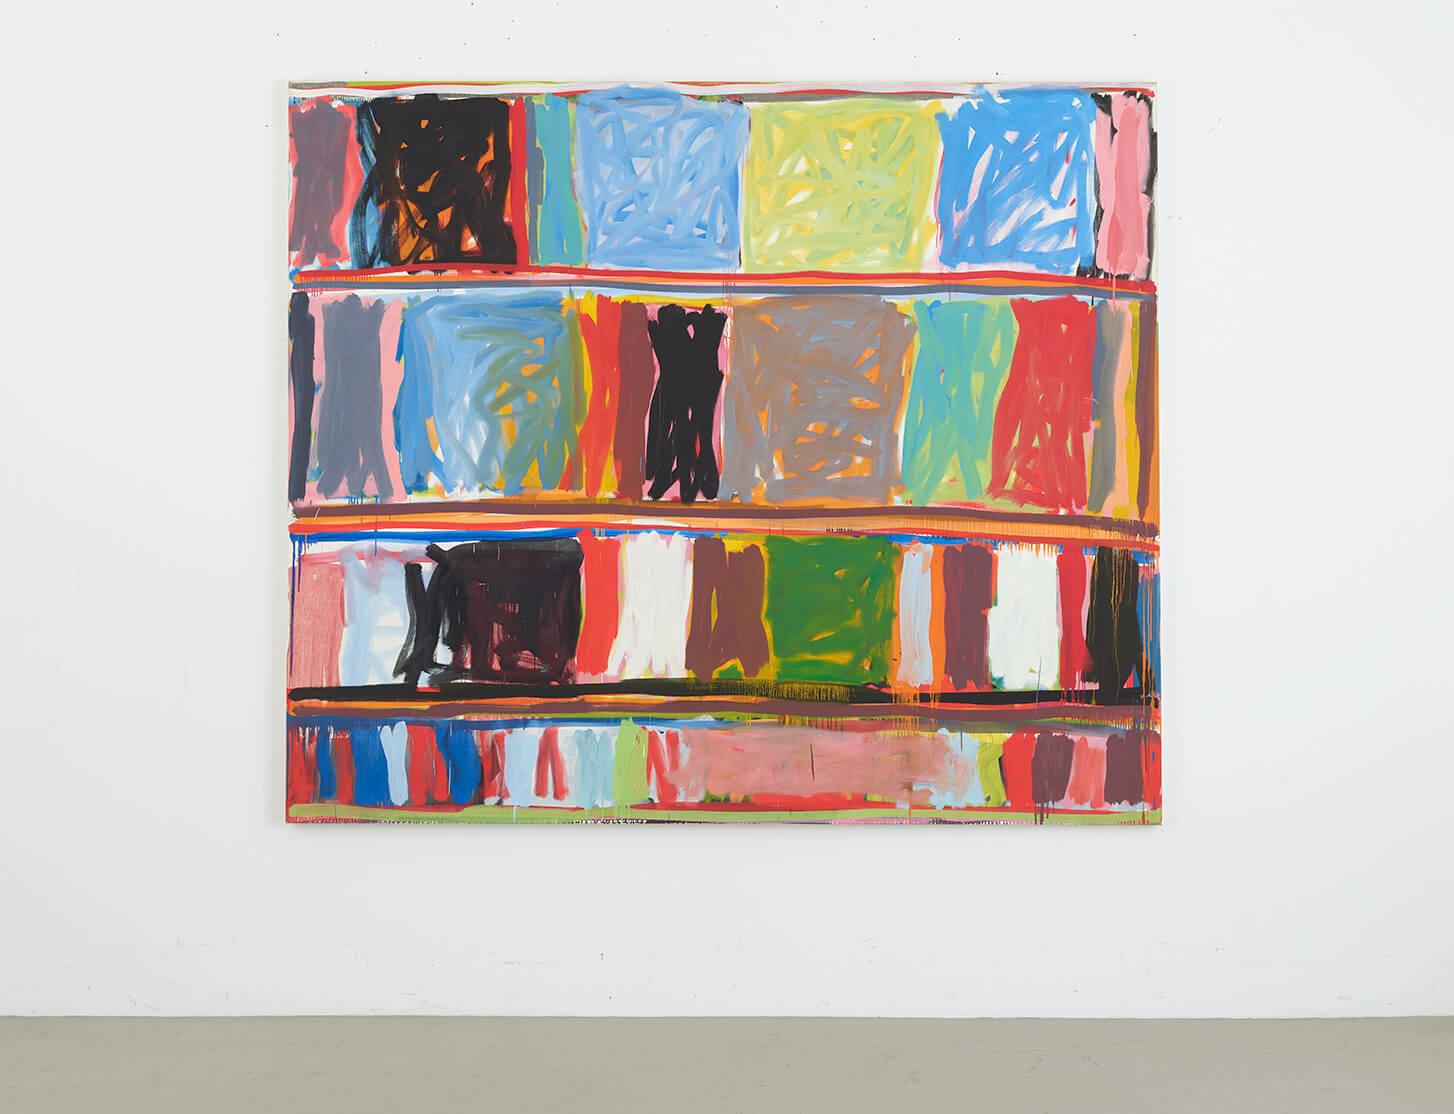 New Stanley Whitney publication to accompany latest exhibition